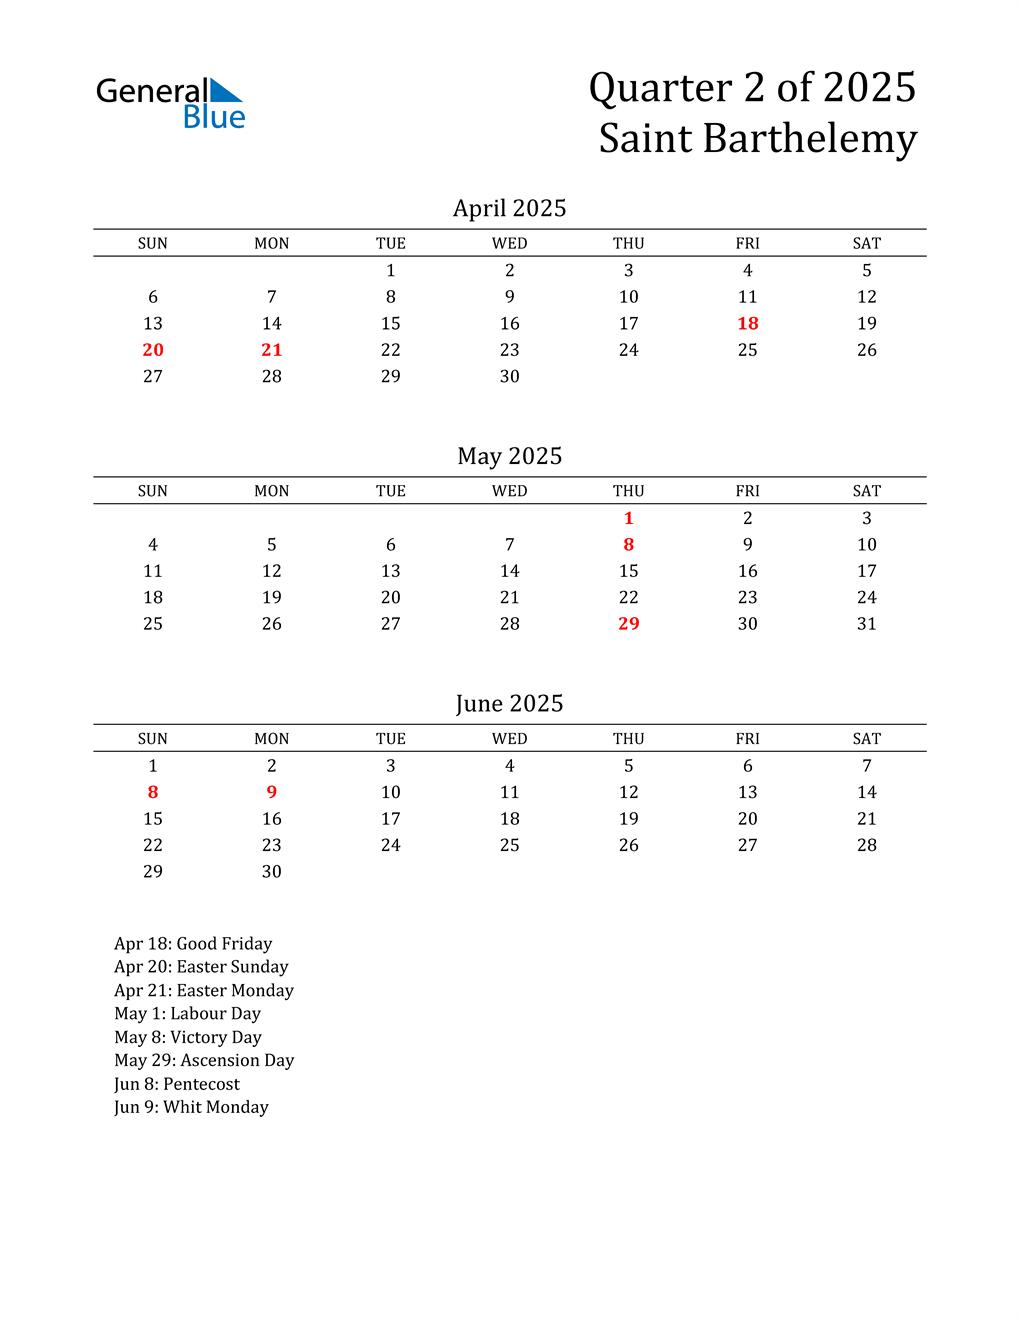 2025 Saint Barthelemy Quarterly Calendar